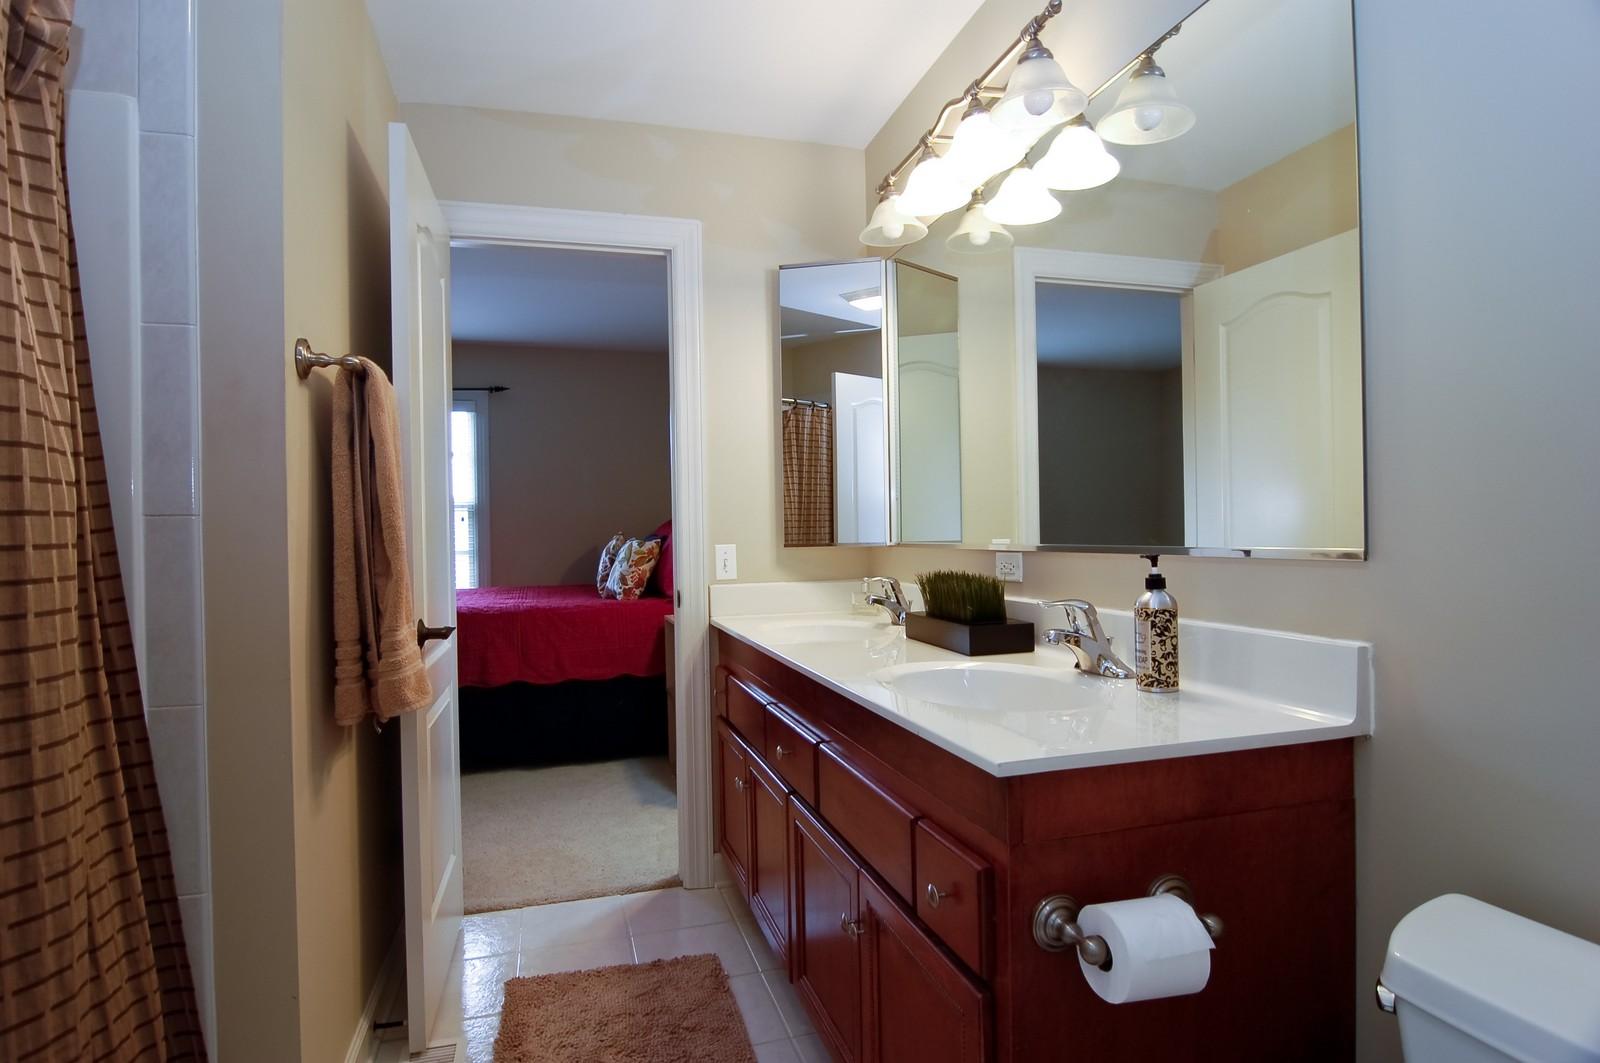 Real Estate Photography - 203 E. Lincoln, Wheaton, IL, 60187 - 3rd Bathroom (Jack and Jill)